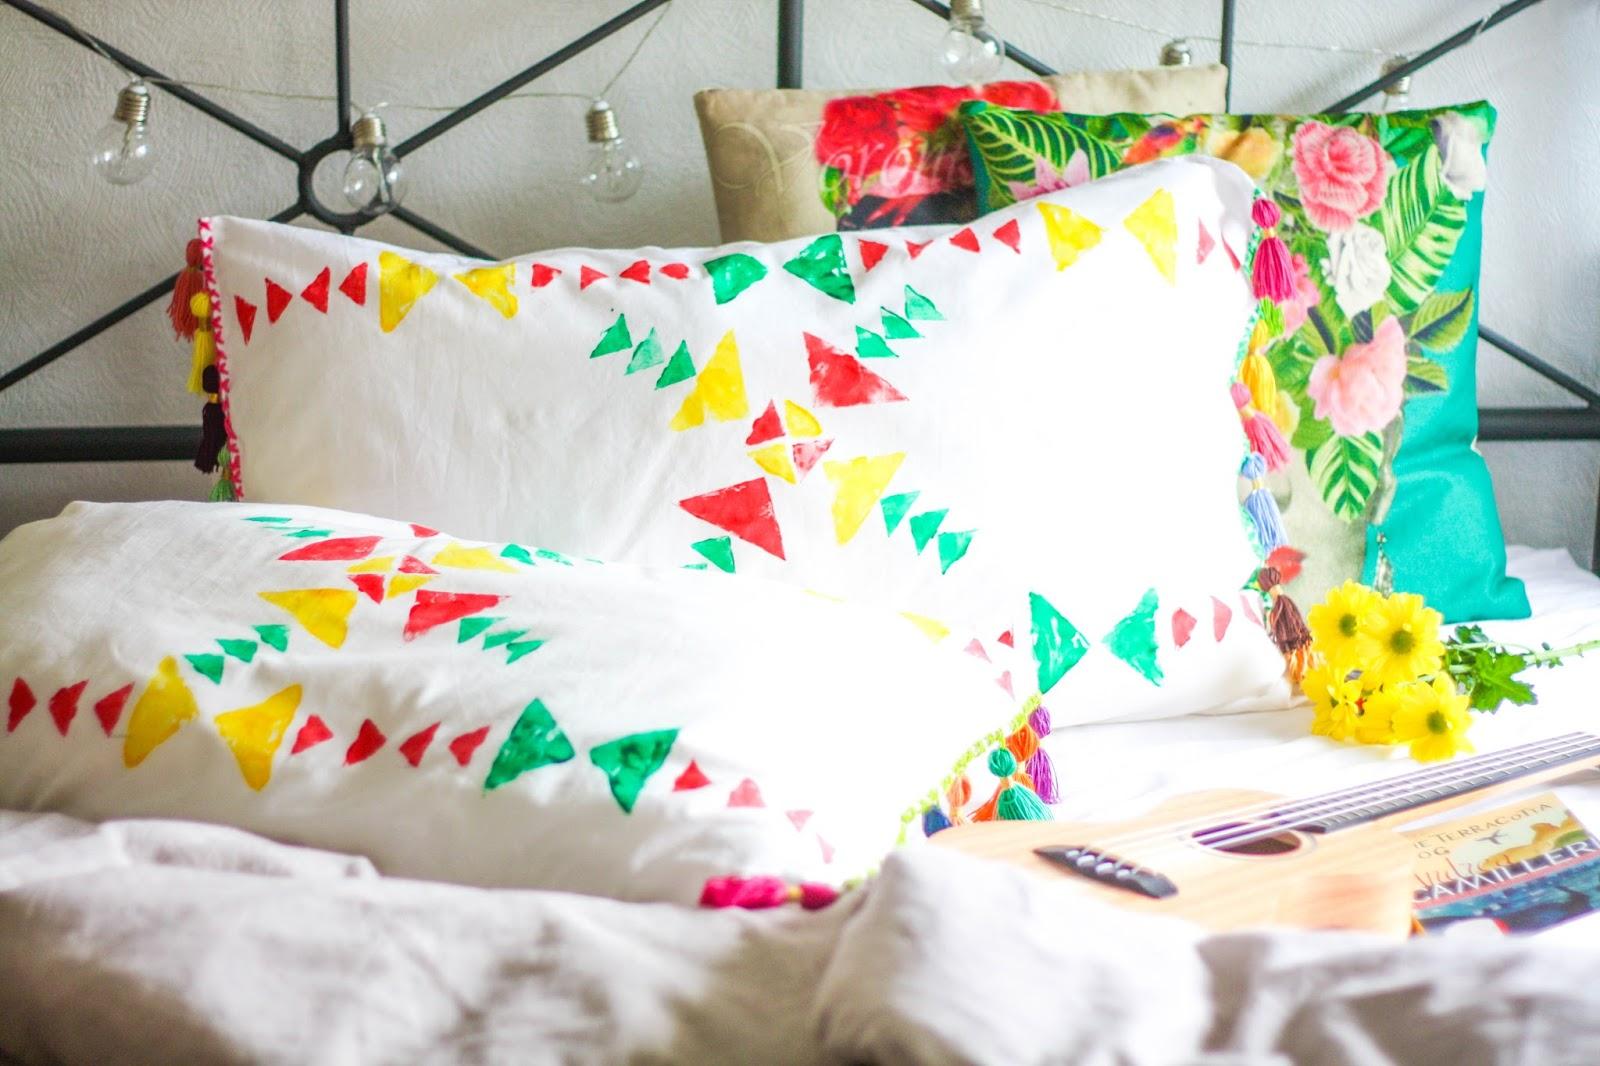 DIY bright tassel cushions and pillows